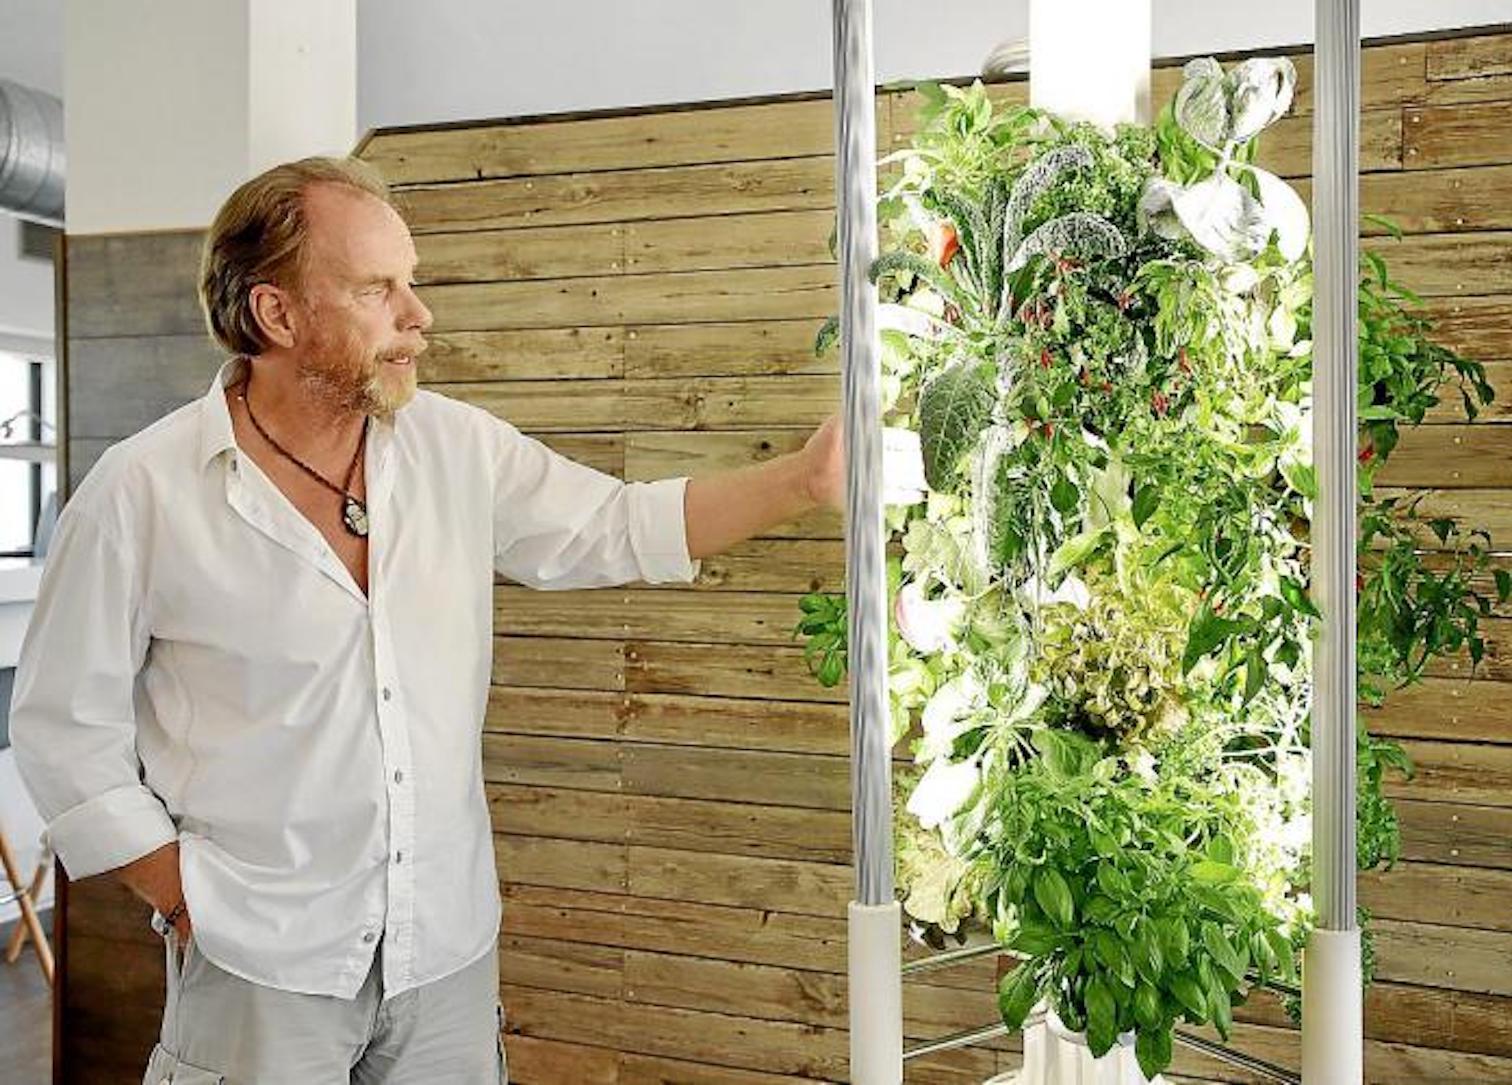 Uli Schwartau, Greeny+ tower inventor.